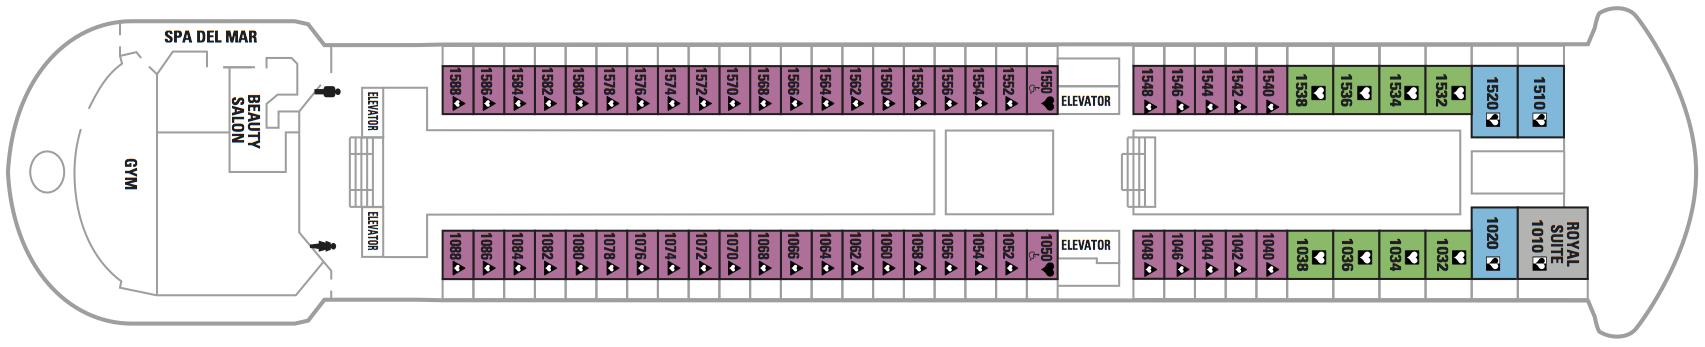 Pullmantur Sovereign Deck Plans Deck 10.jpg